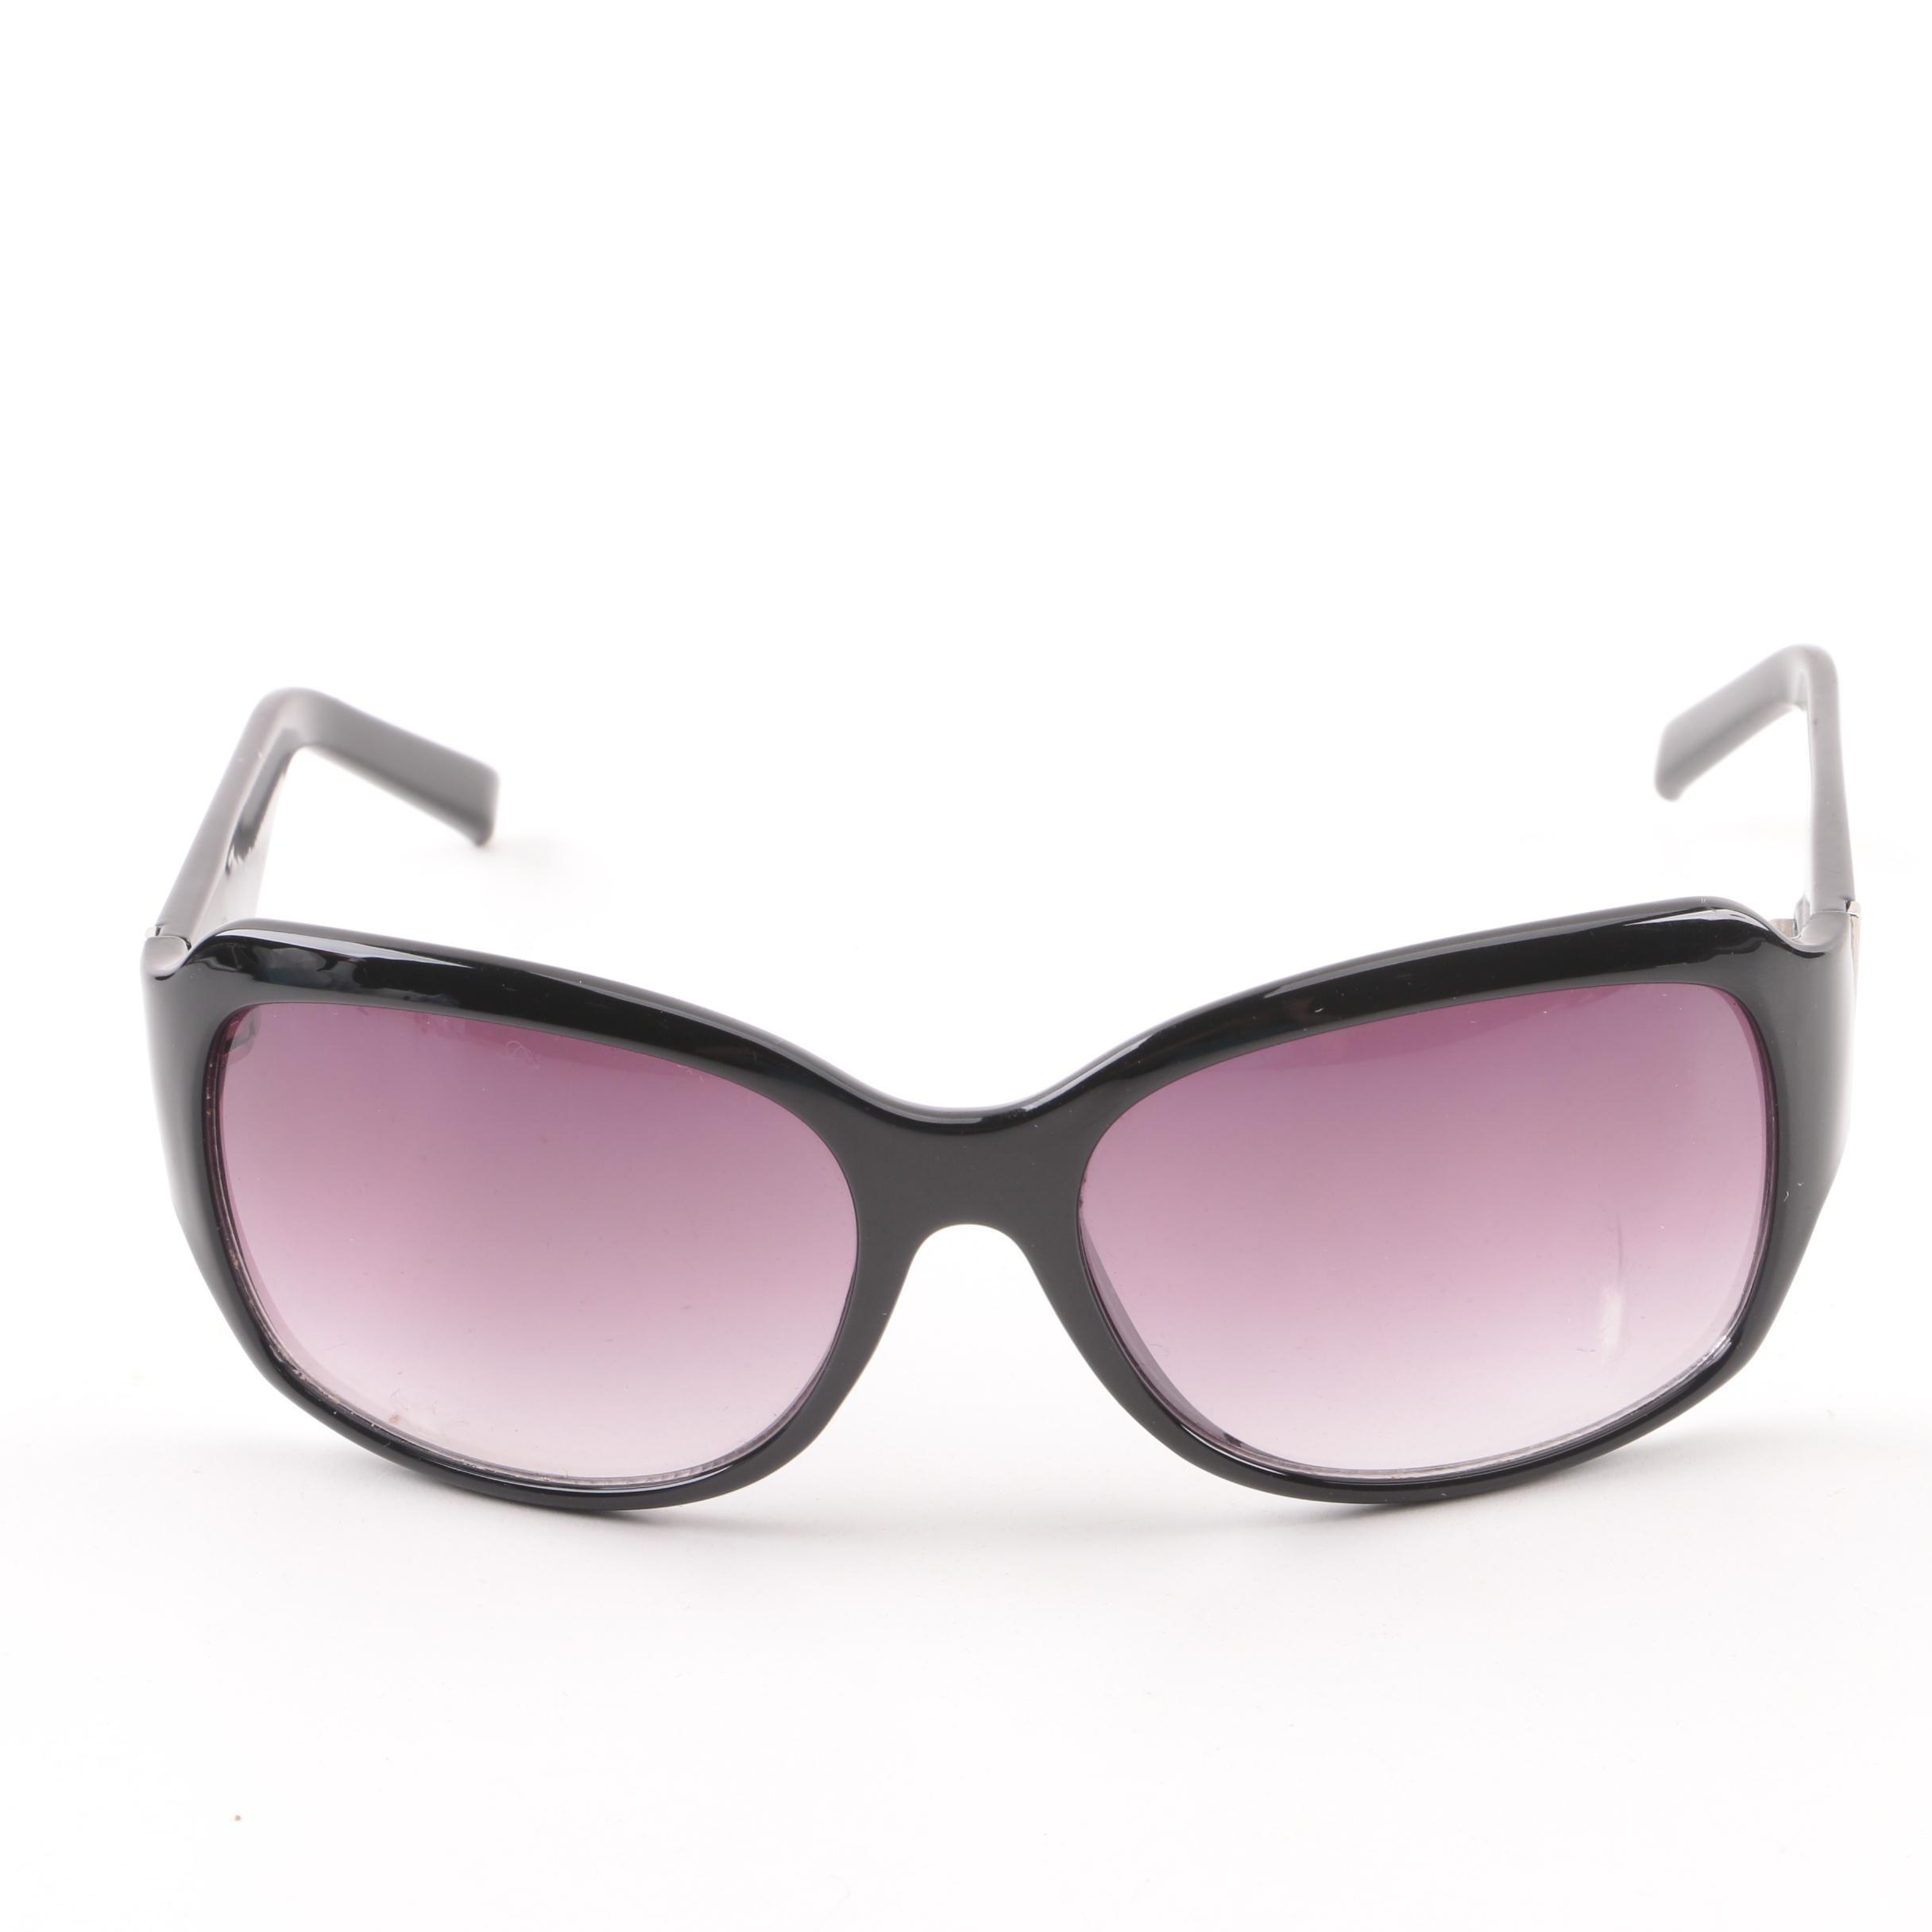 Ann Taylor Loft Black Wrap Style Sunglasses